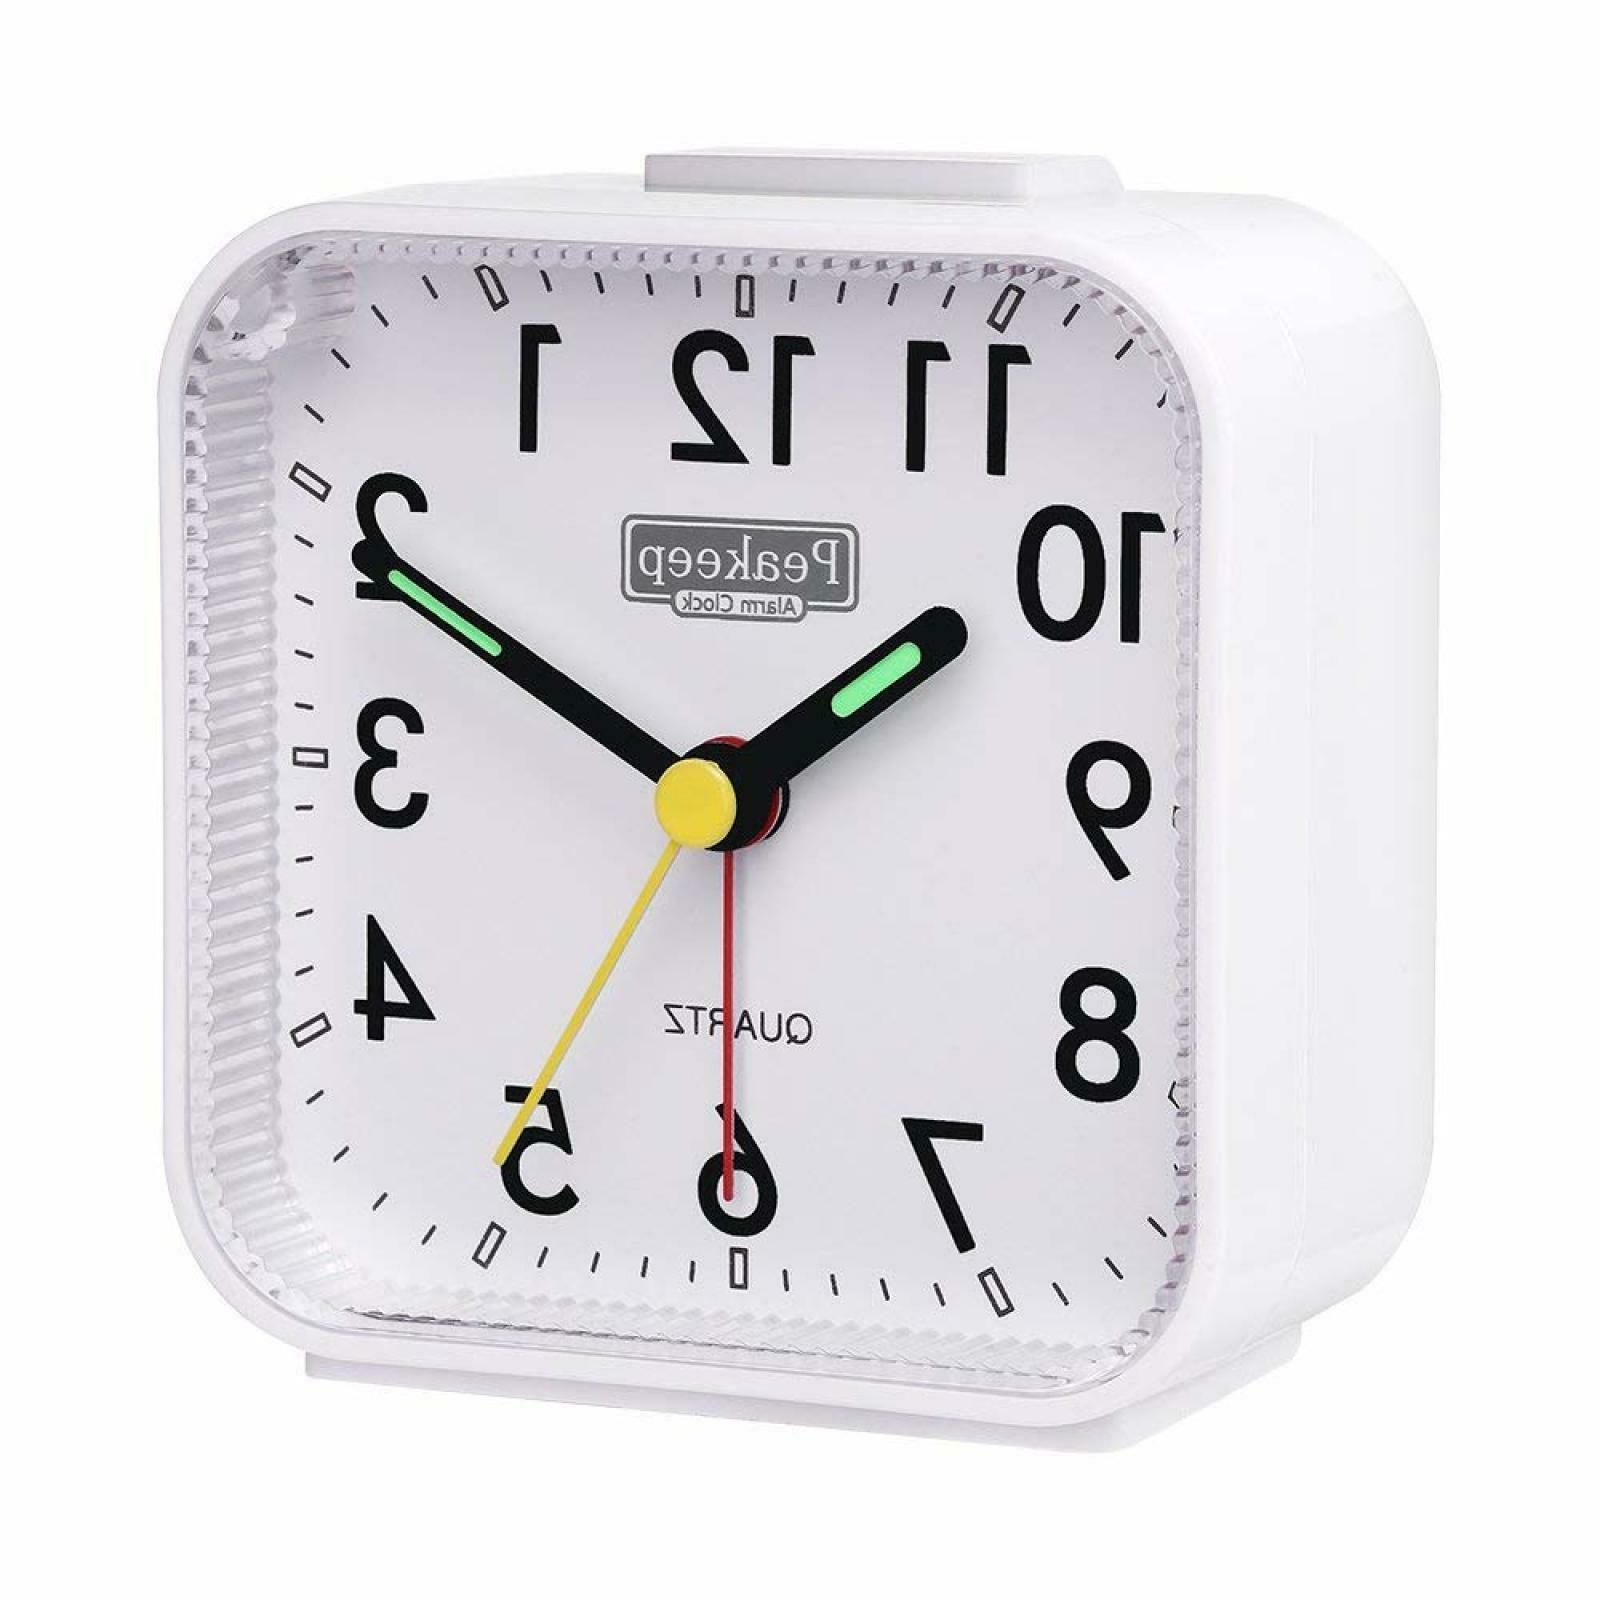 Peakeep Small Analog Alarm Clock Silent No Ticking,